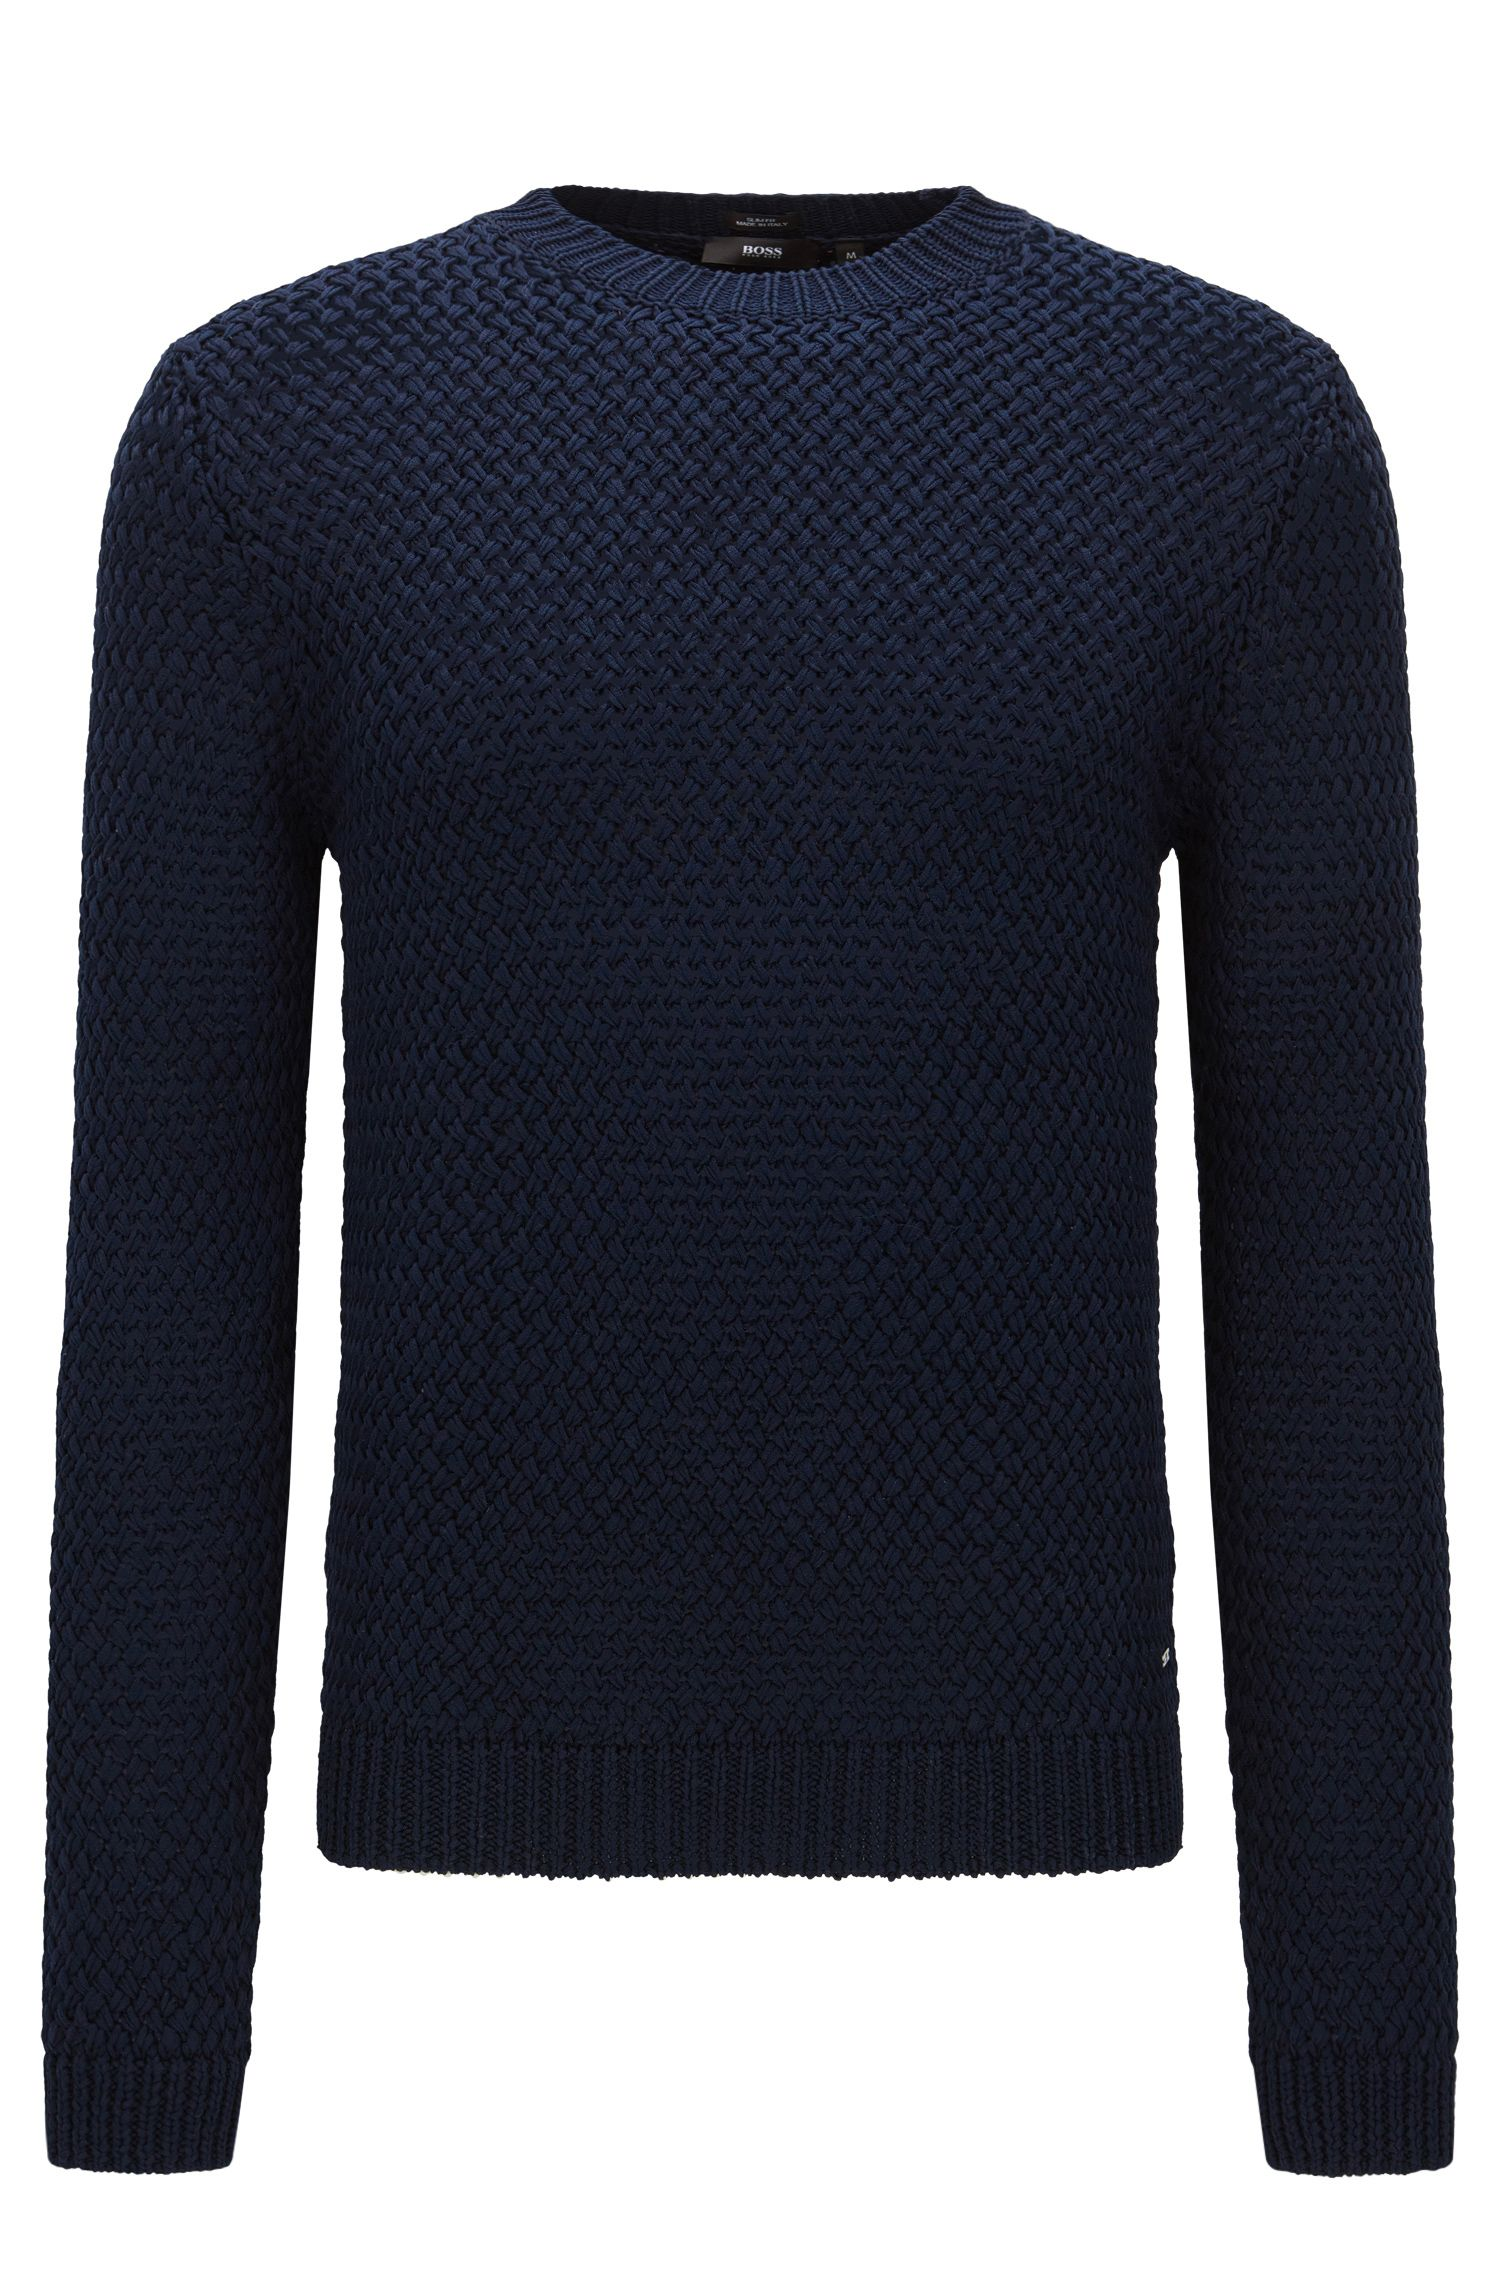 Unifarbener Slim-Fit Pullover aus Baumwolle: 'Olex'